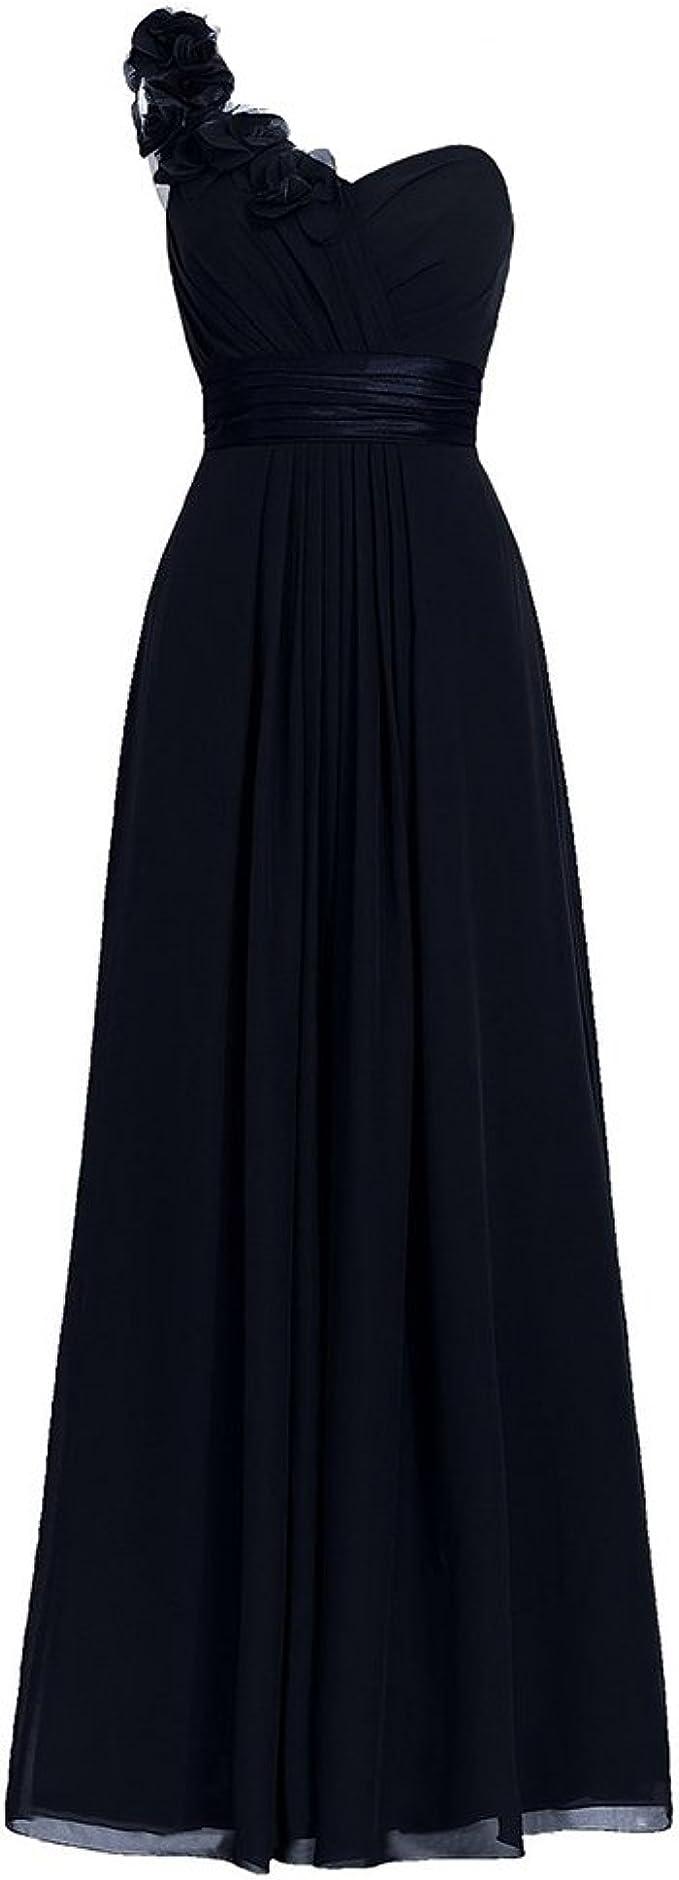 10 sizes IN STOCK Evening Prom Dress Morning Haze Bridesmaid Floor Length Flowy Pinky Gray Cute Custom Made Formal Dress 8 ready to ship